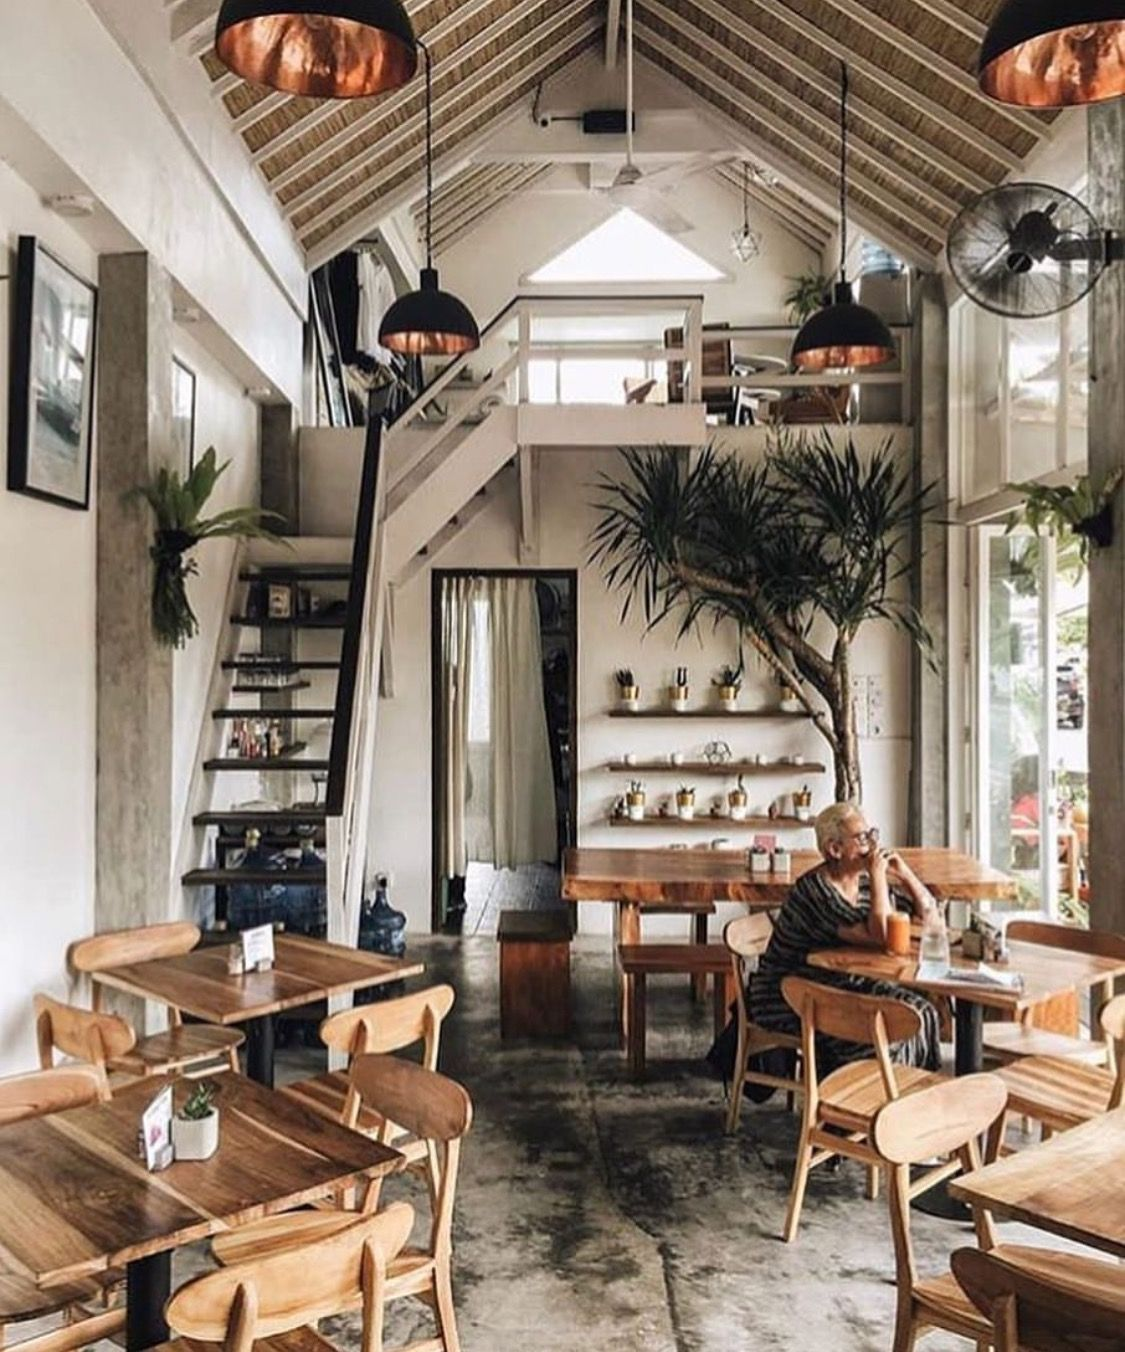 COZY ROOM COFFEE SHOP DESIGN IDEAS | Cafe interior design ...